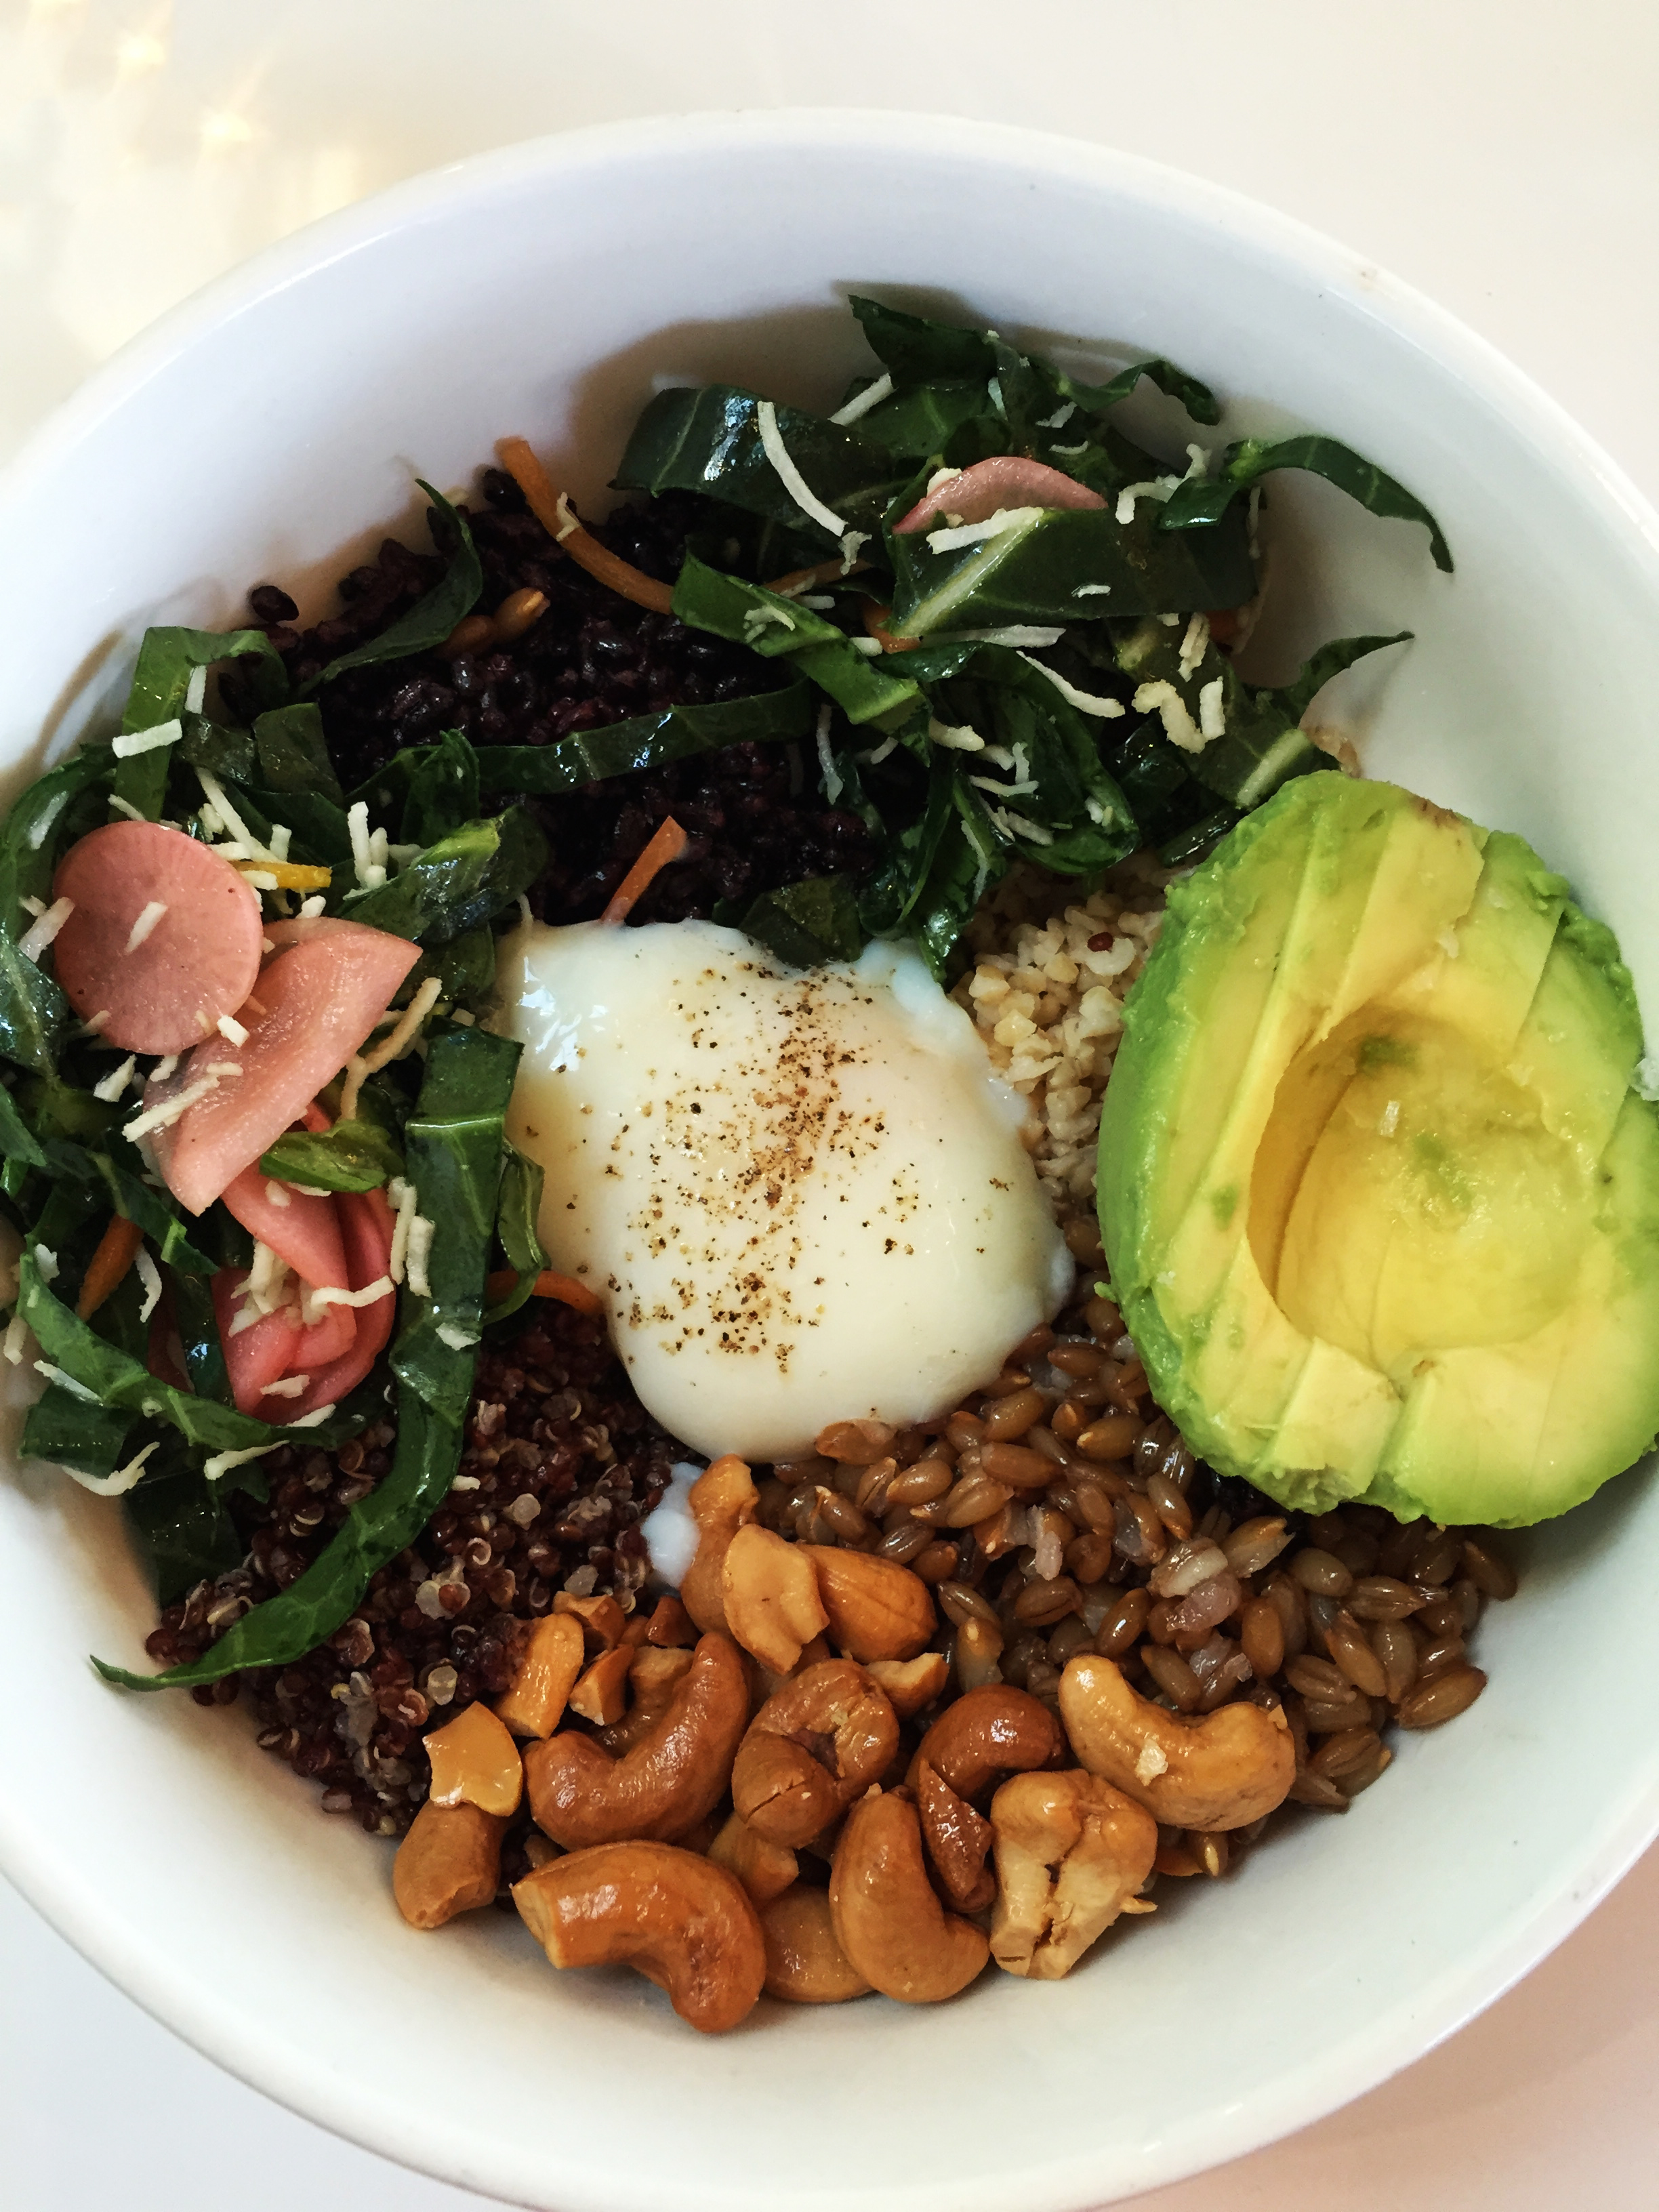 Grain Bowl with runny egg, pickles, collard slaw, cashews, and avocado.